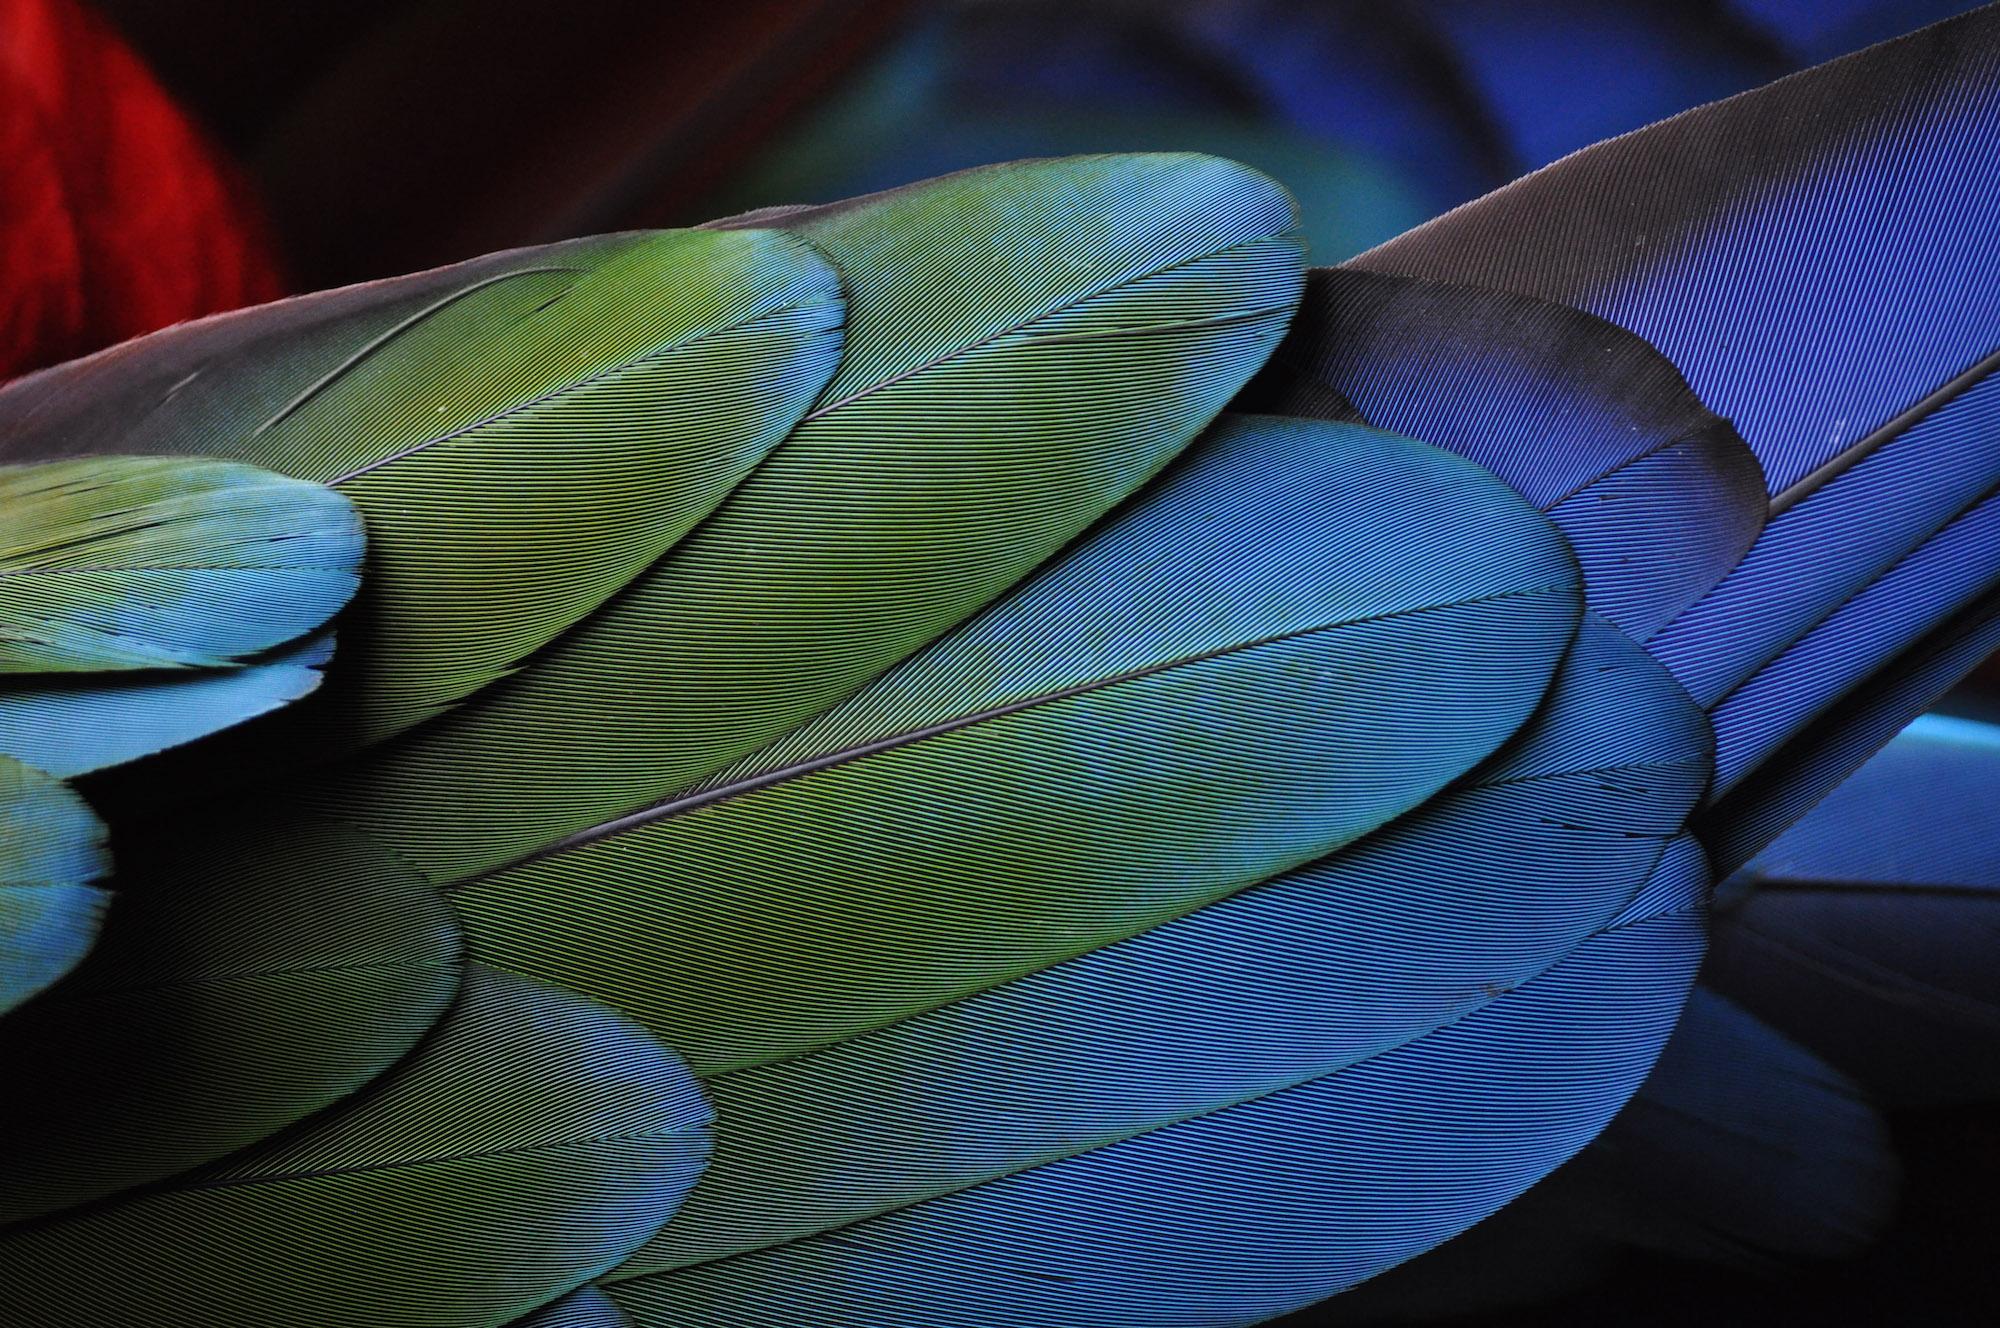 life-of-pix-free-stock-photos-parrot-feather-green-blue-photostockeditor